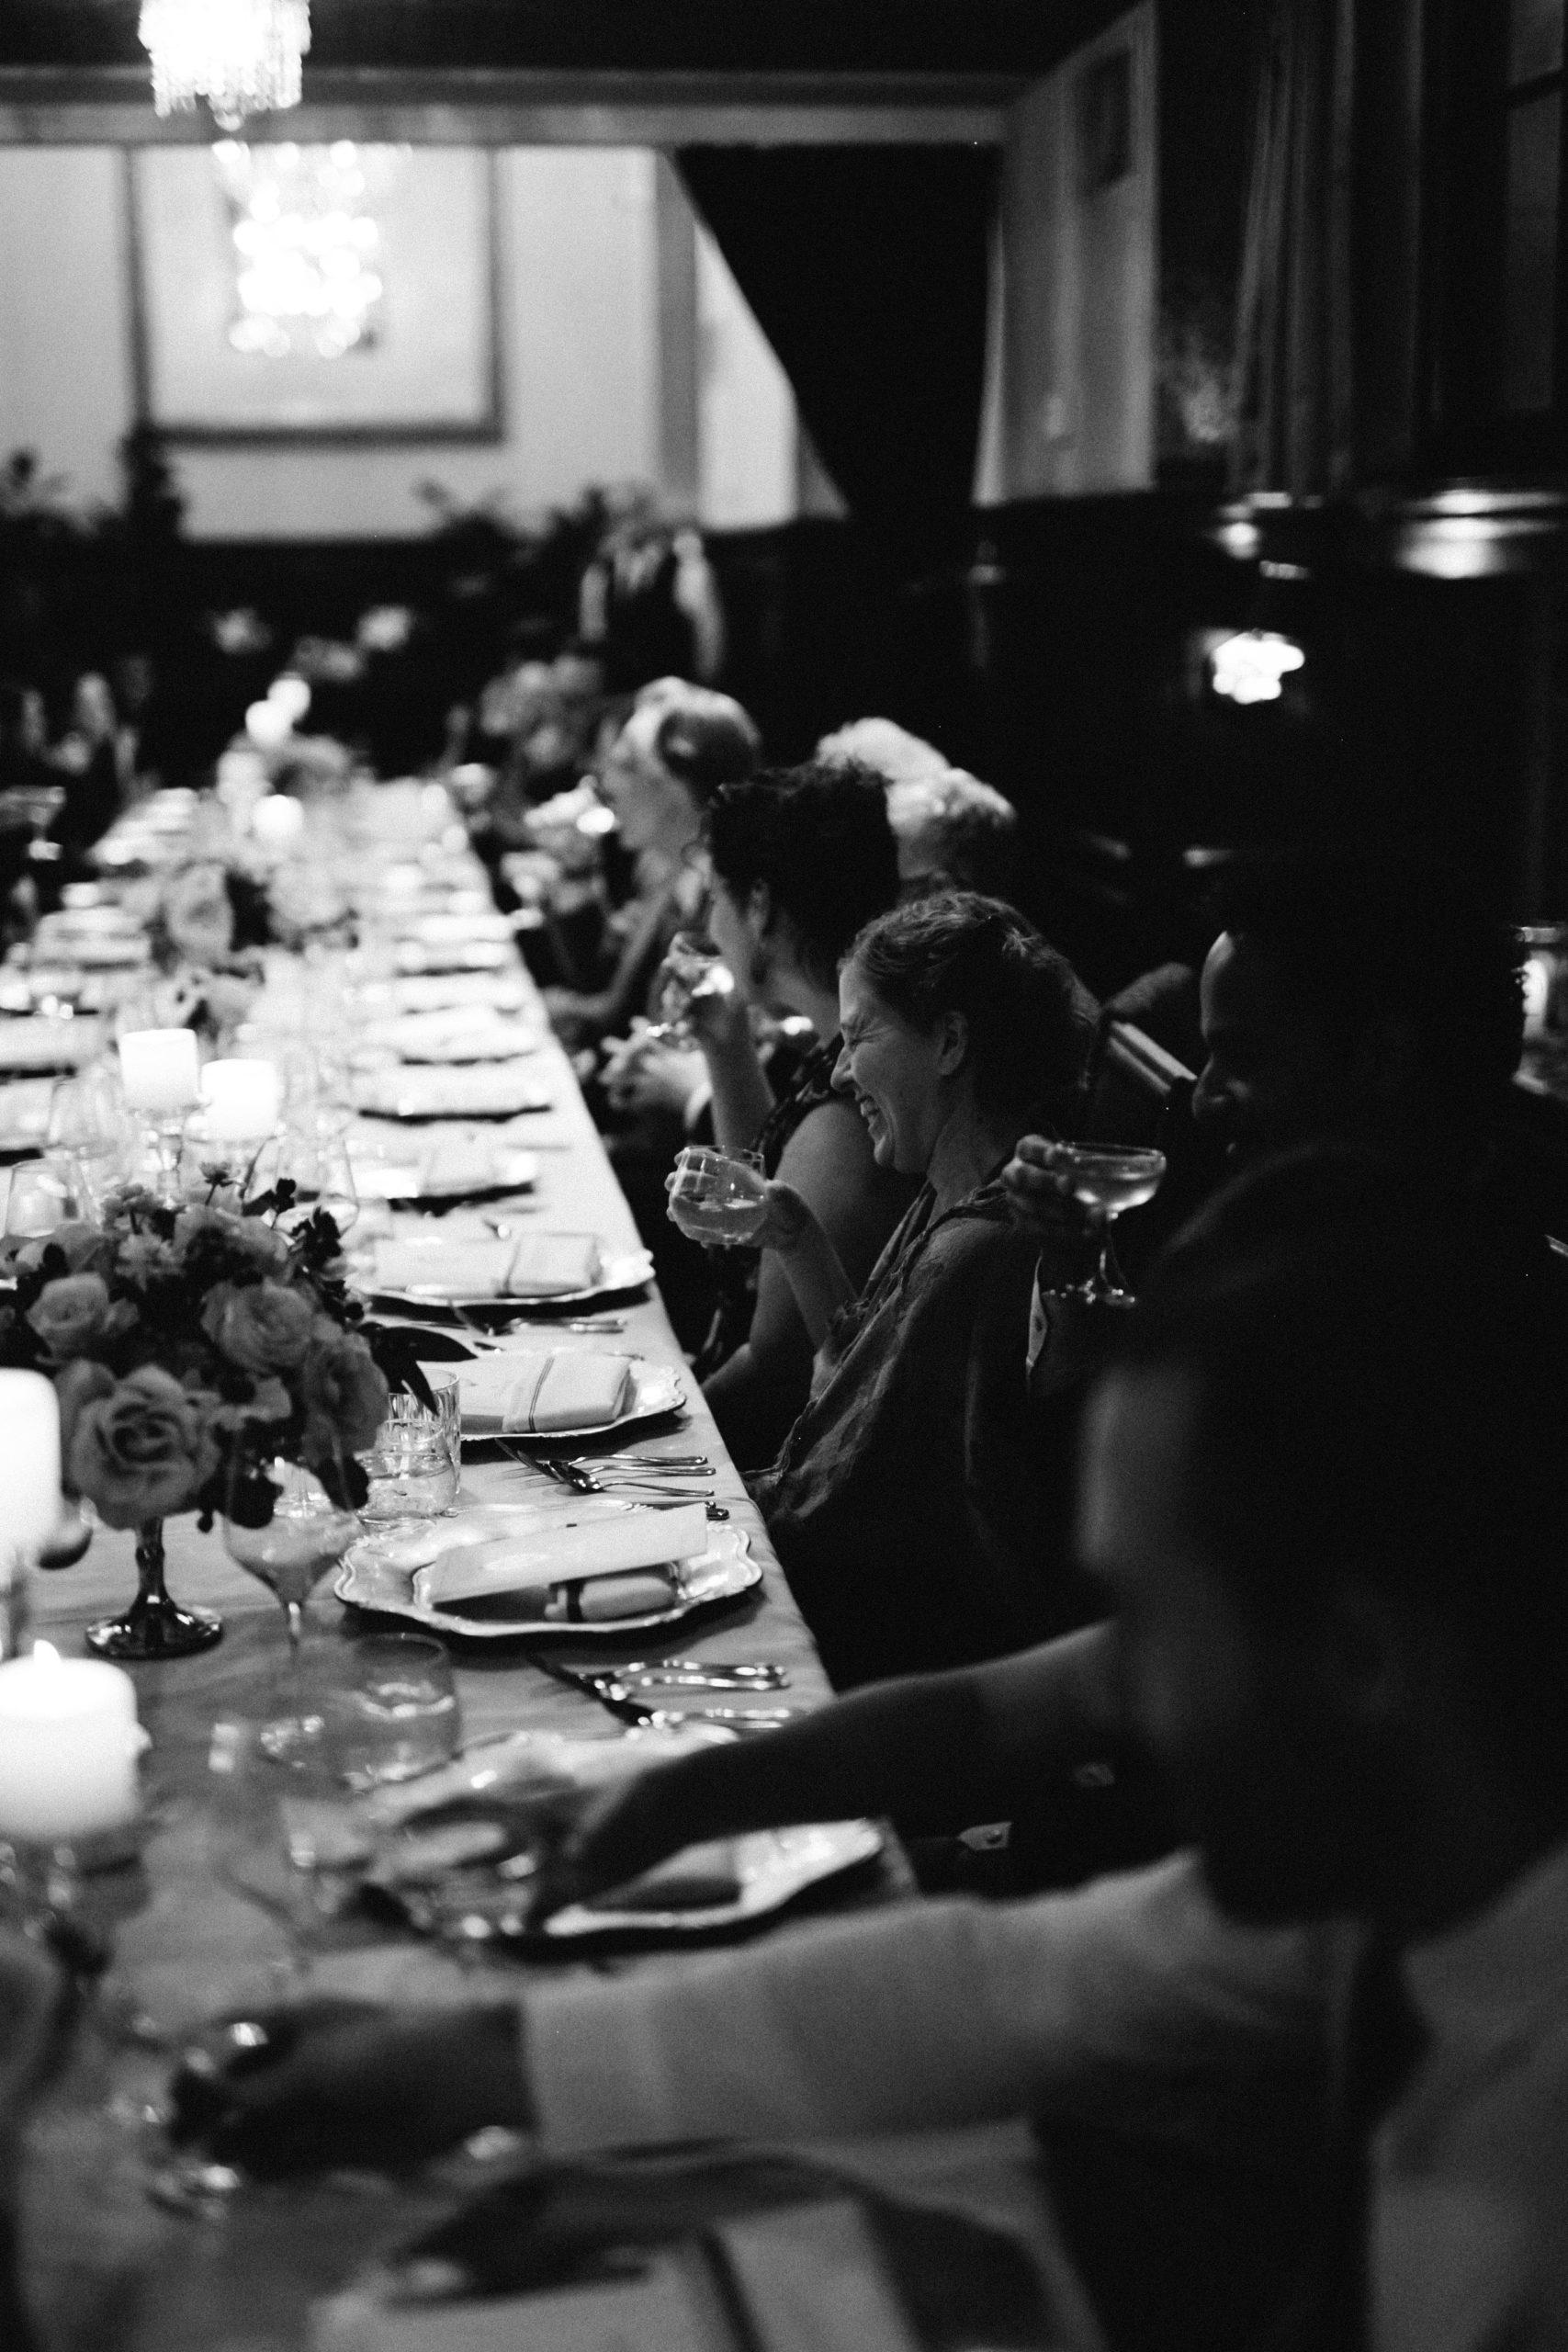 Long dinner table at wedding reception